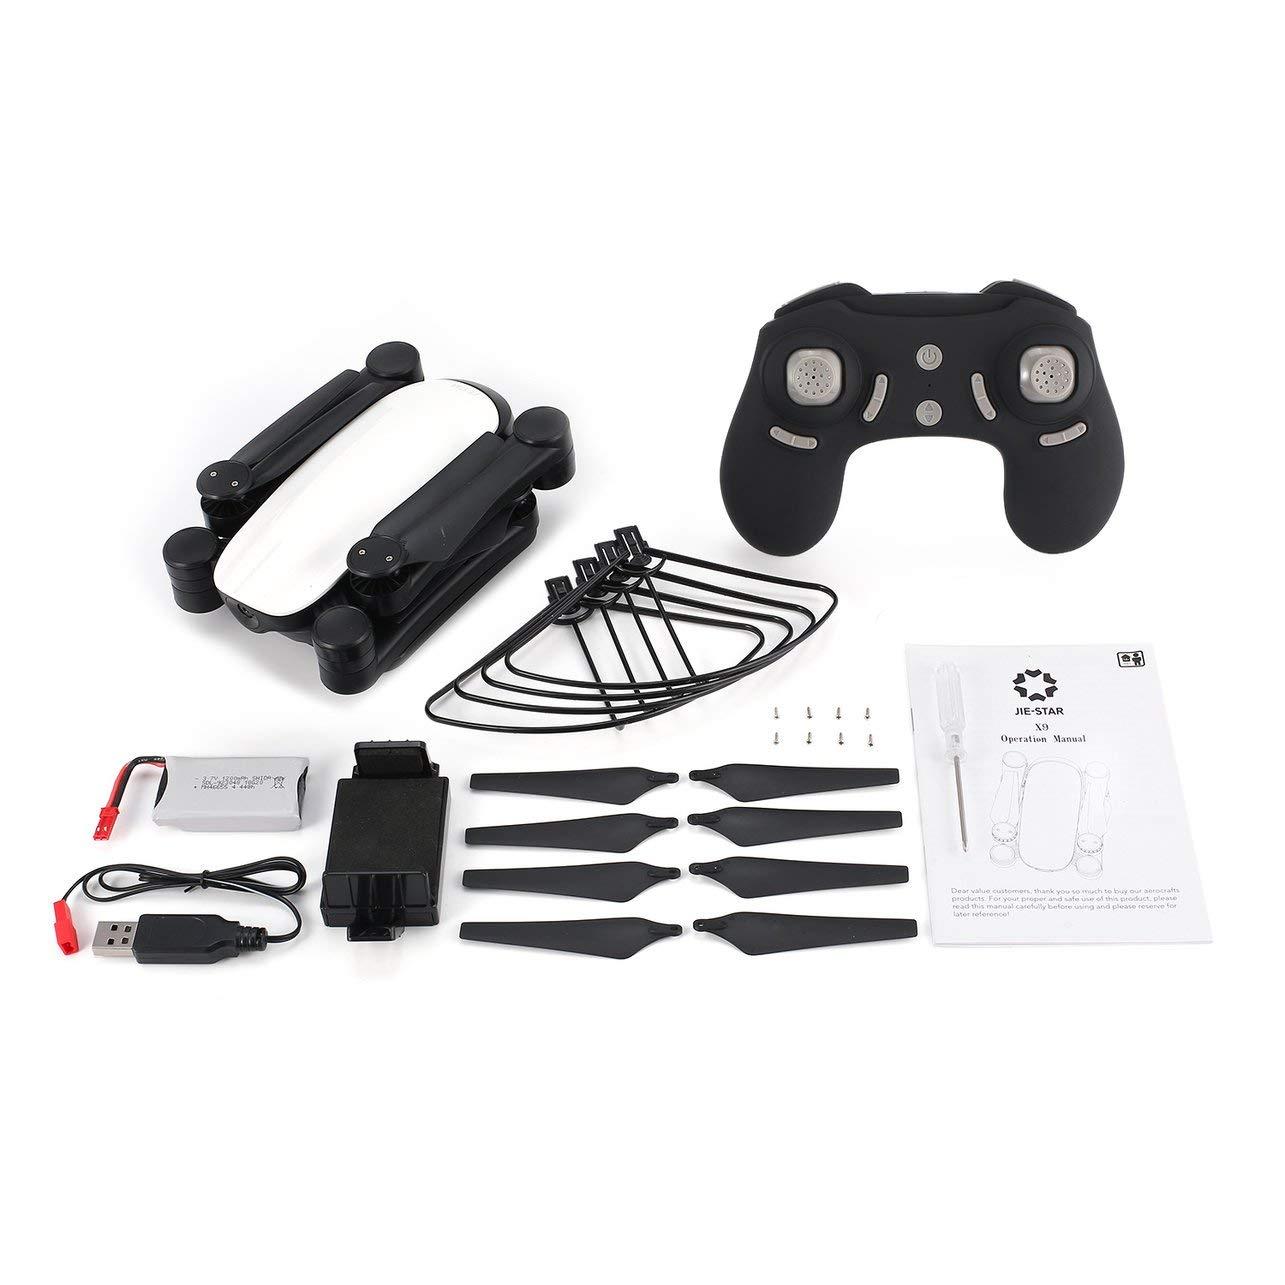 Amazon.com: WOSOSYEYO X9 RC Drone 2.4G FPV Foldable Quadcopter 0.3MP WiFi Camera Altitude Hold,White: Toys & Games